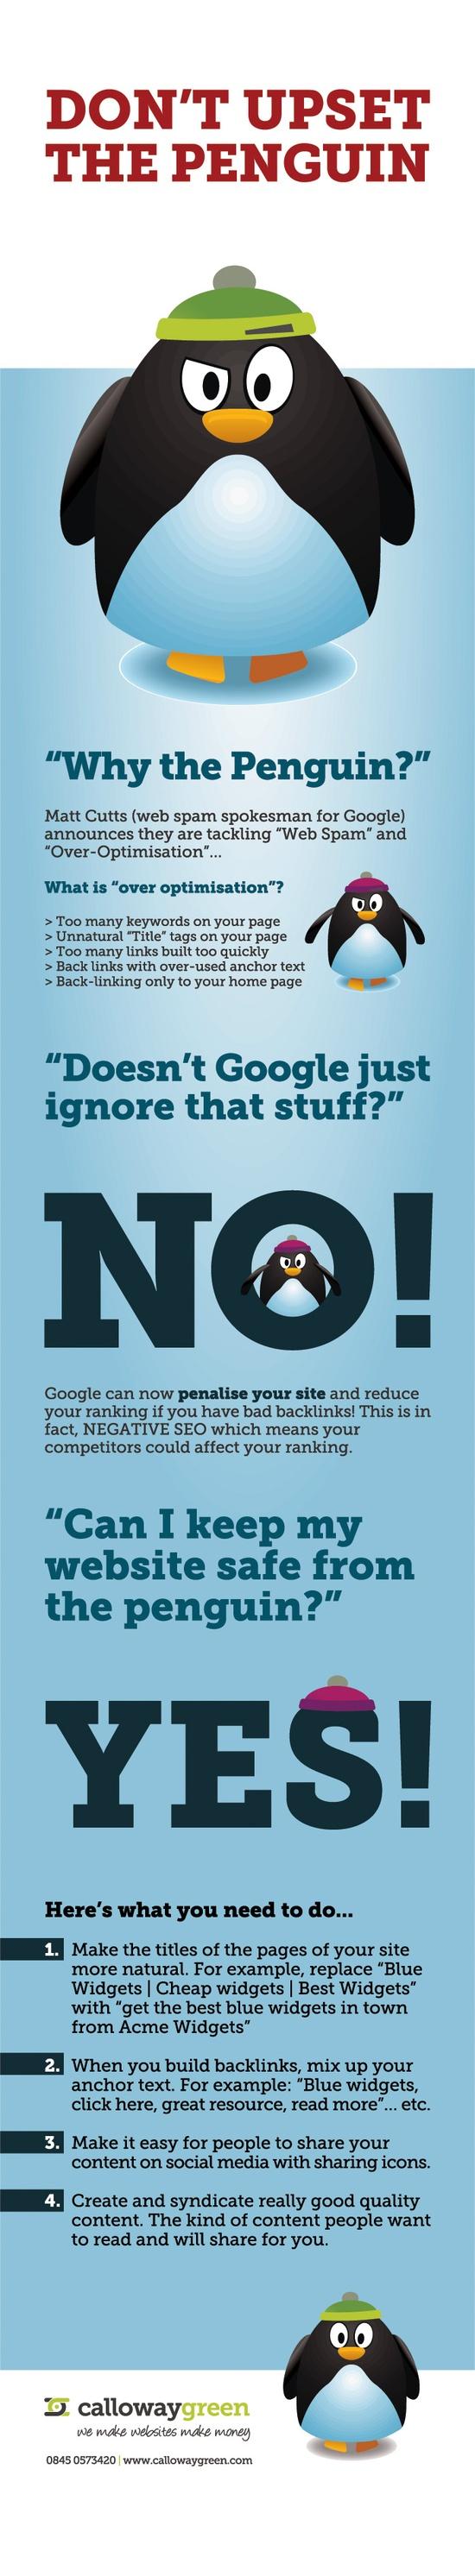 dont upset the penguin